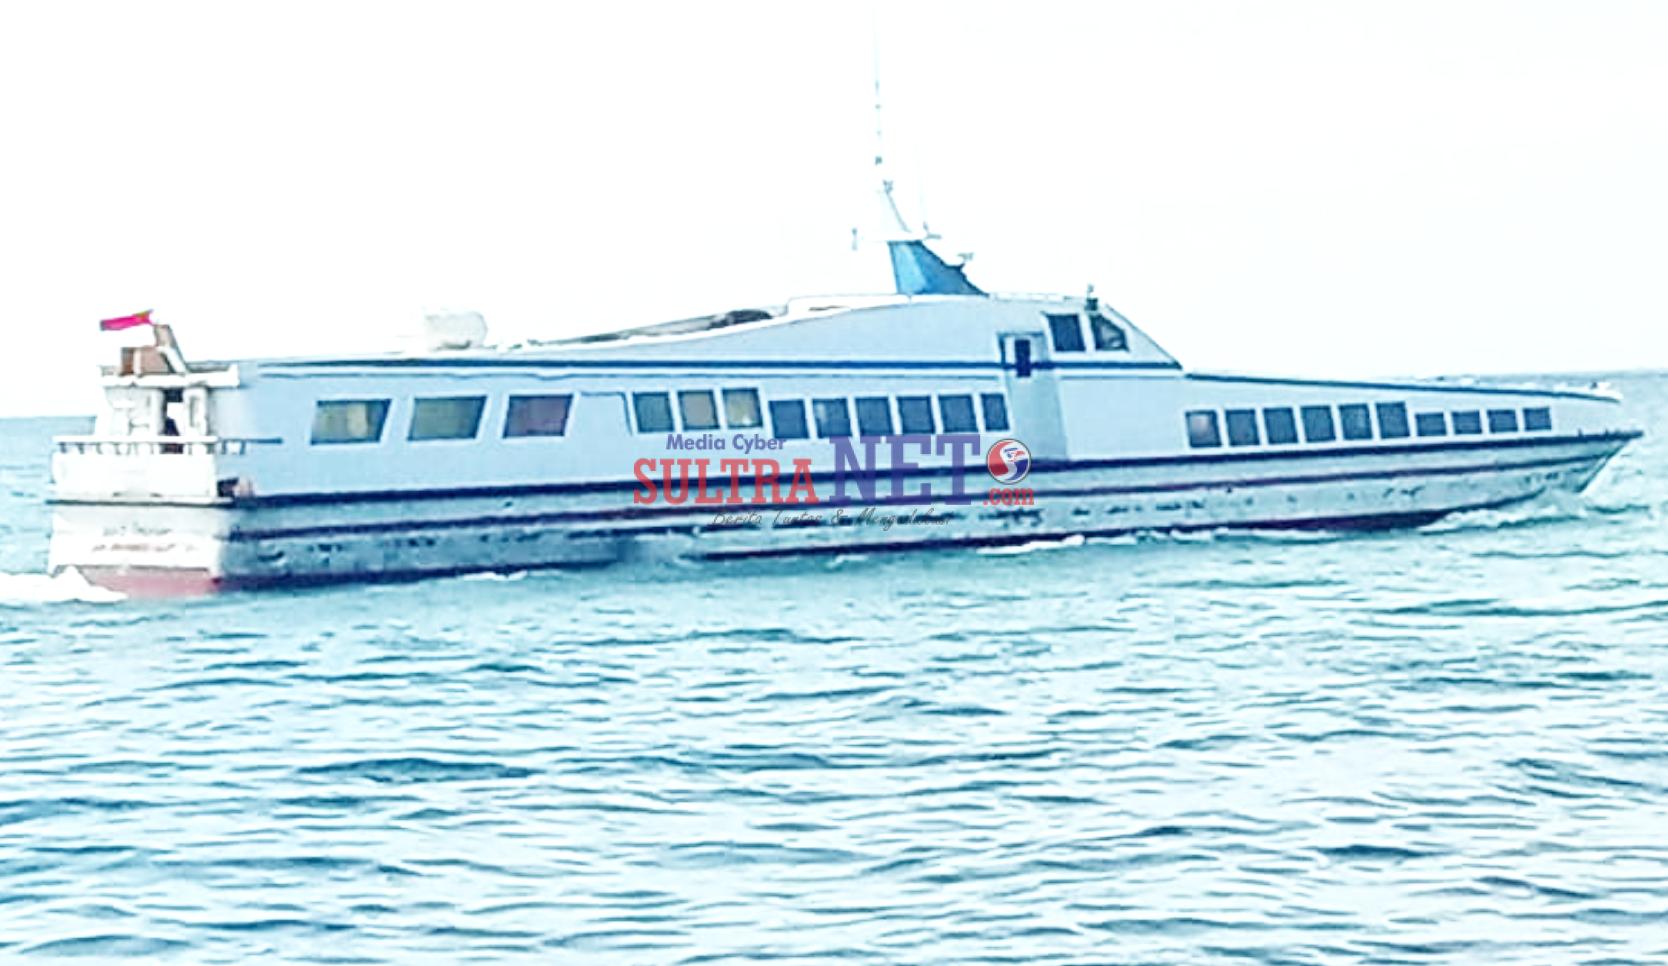 Foto Superjet 10 yang bakal melayani pelayaran di Dombana